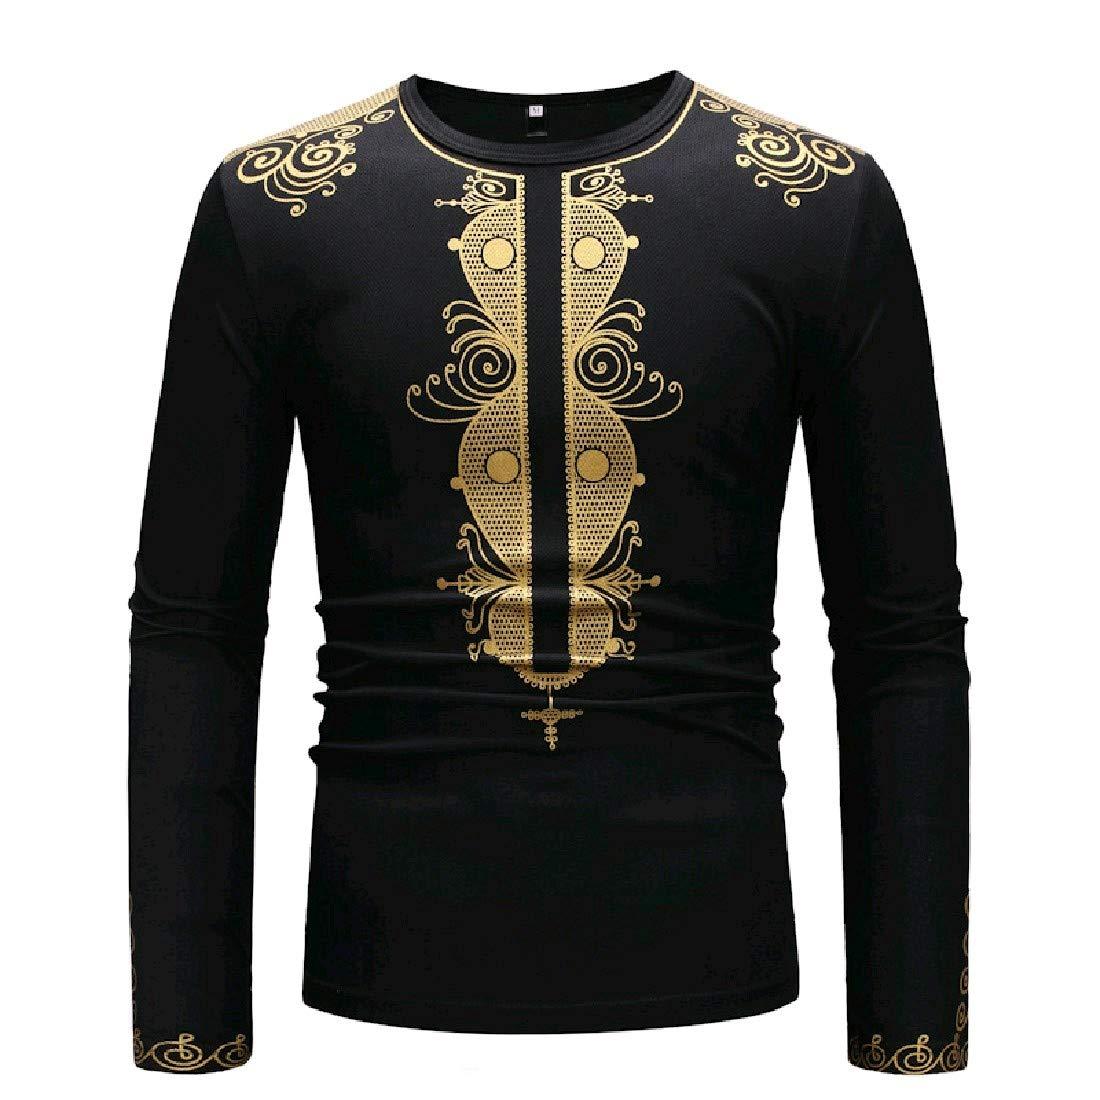 YUNY Mens African Dashiki Flower Printed Plus Size T-Shirt Top Black S